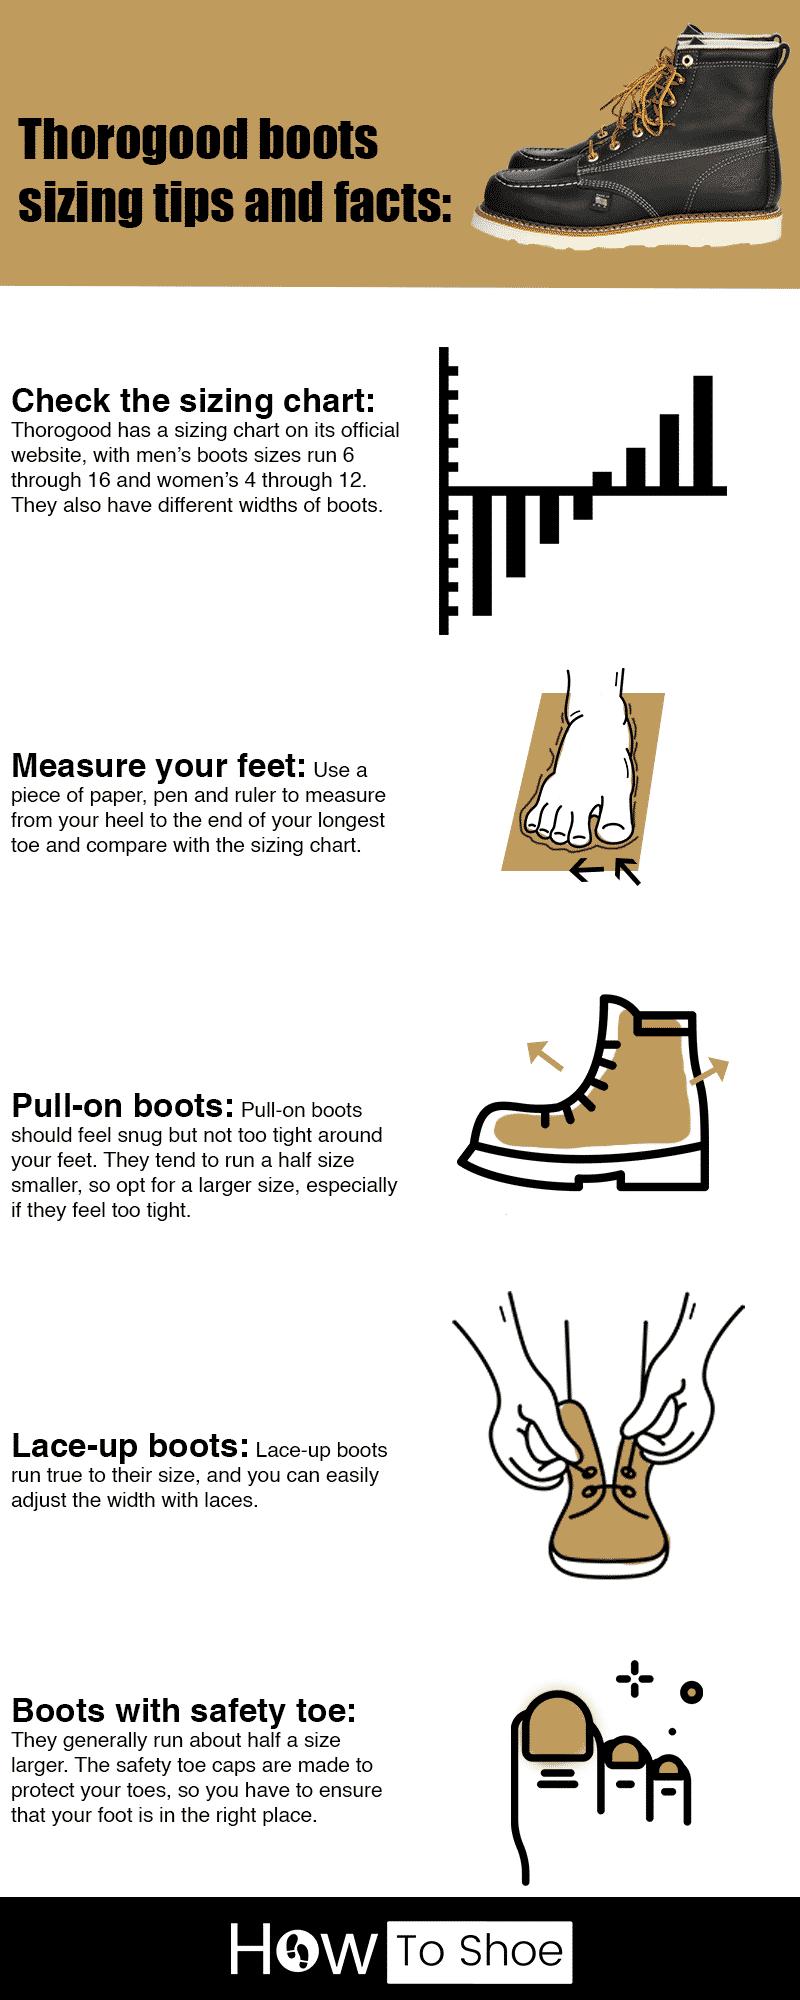 Thorogood Boots Sizing infographic